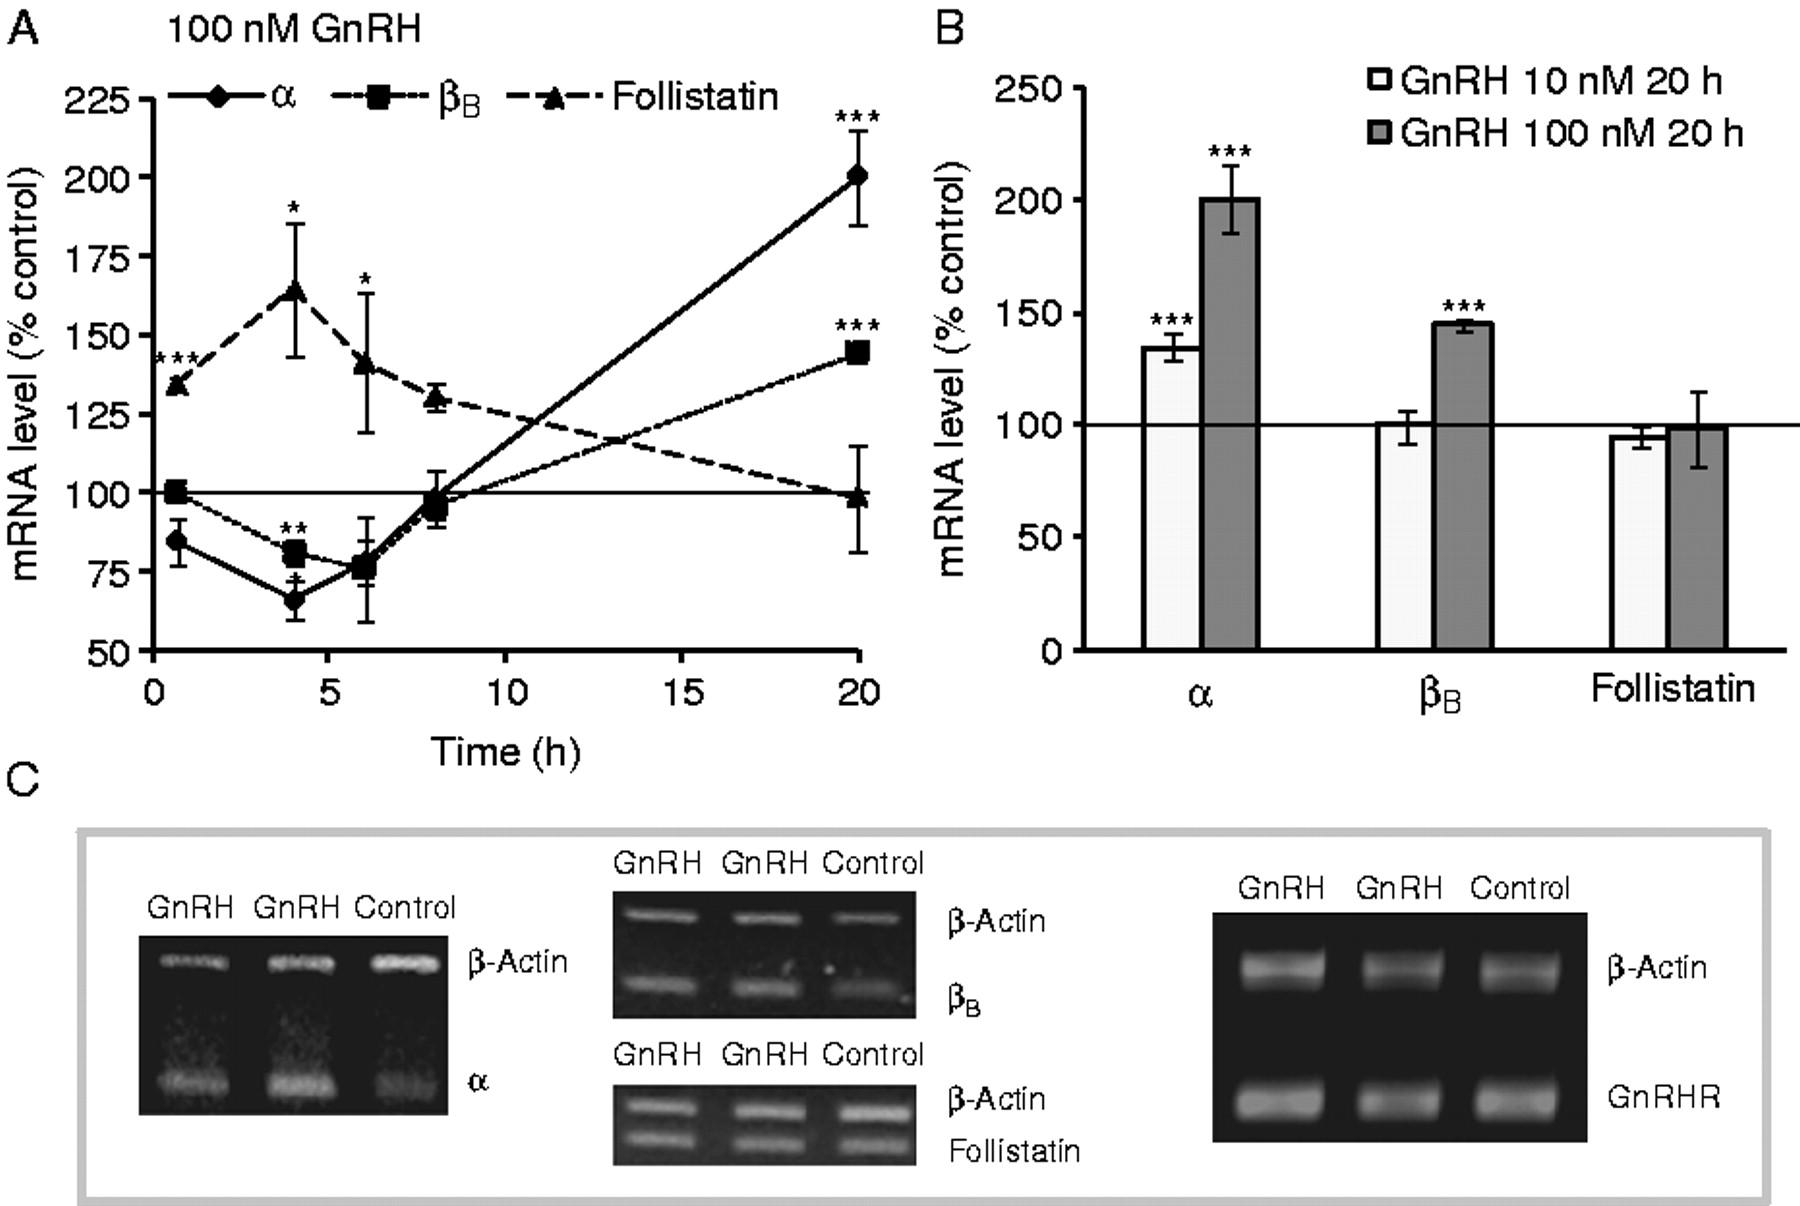 Regulation of pituitary inhibin/activin subunits and follistatin